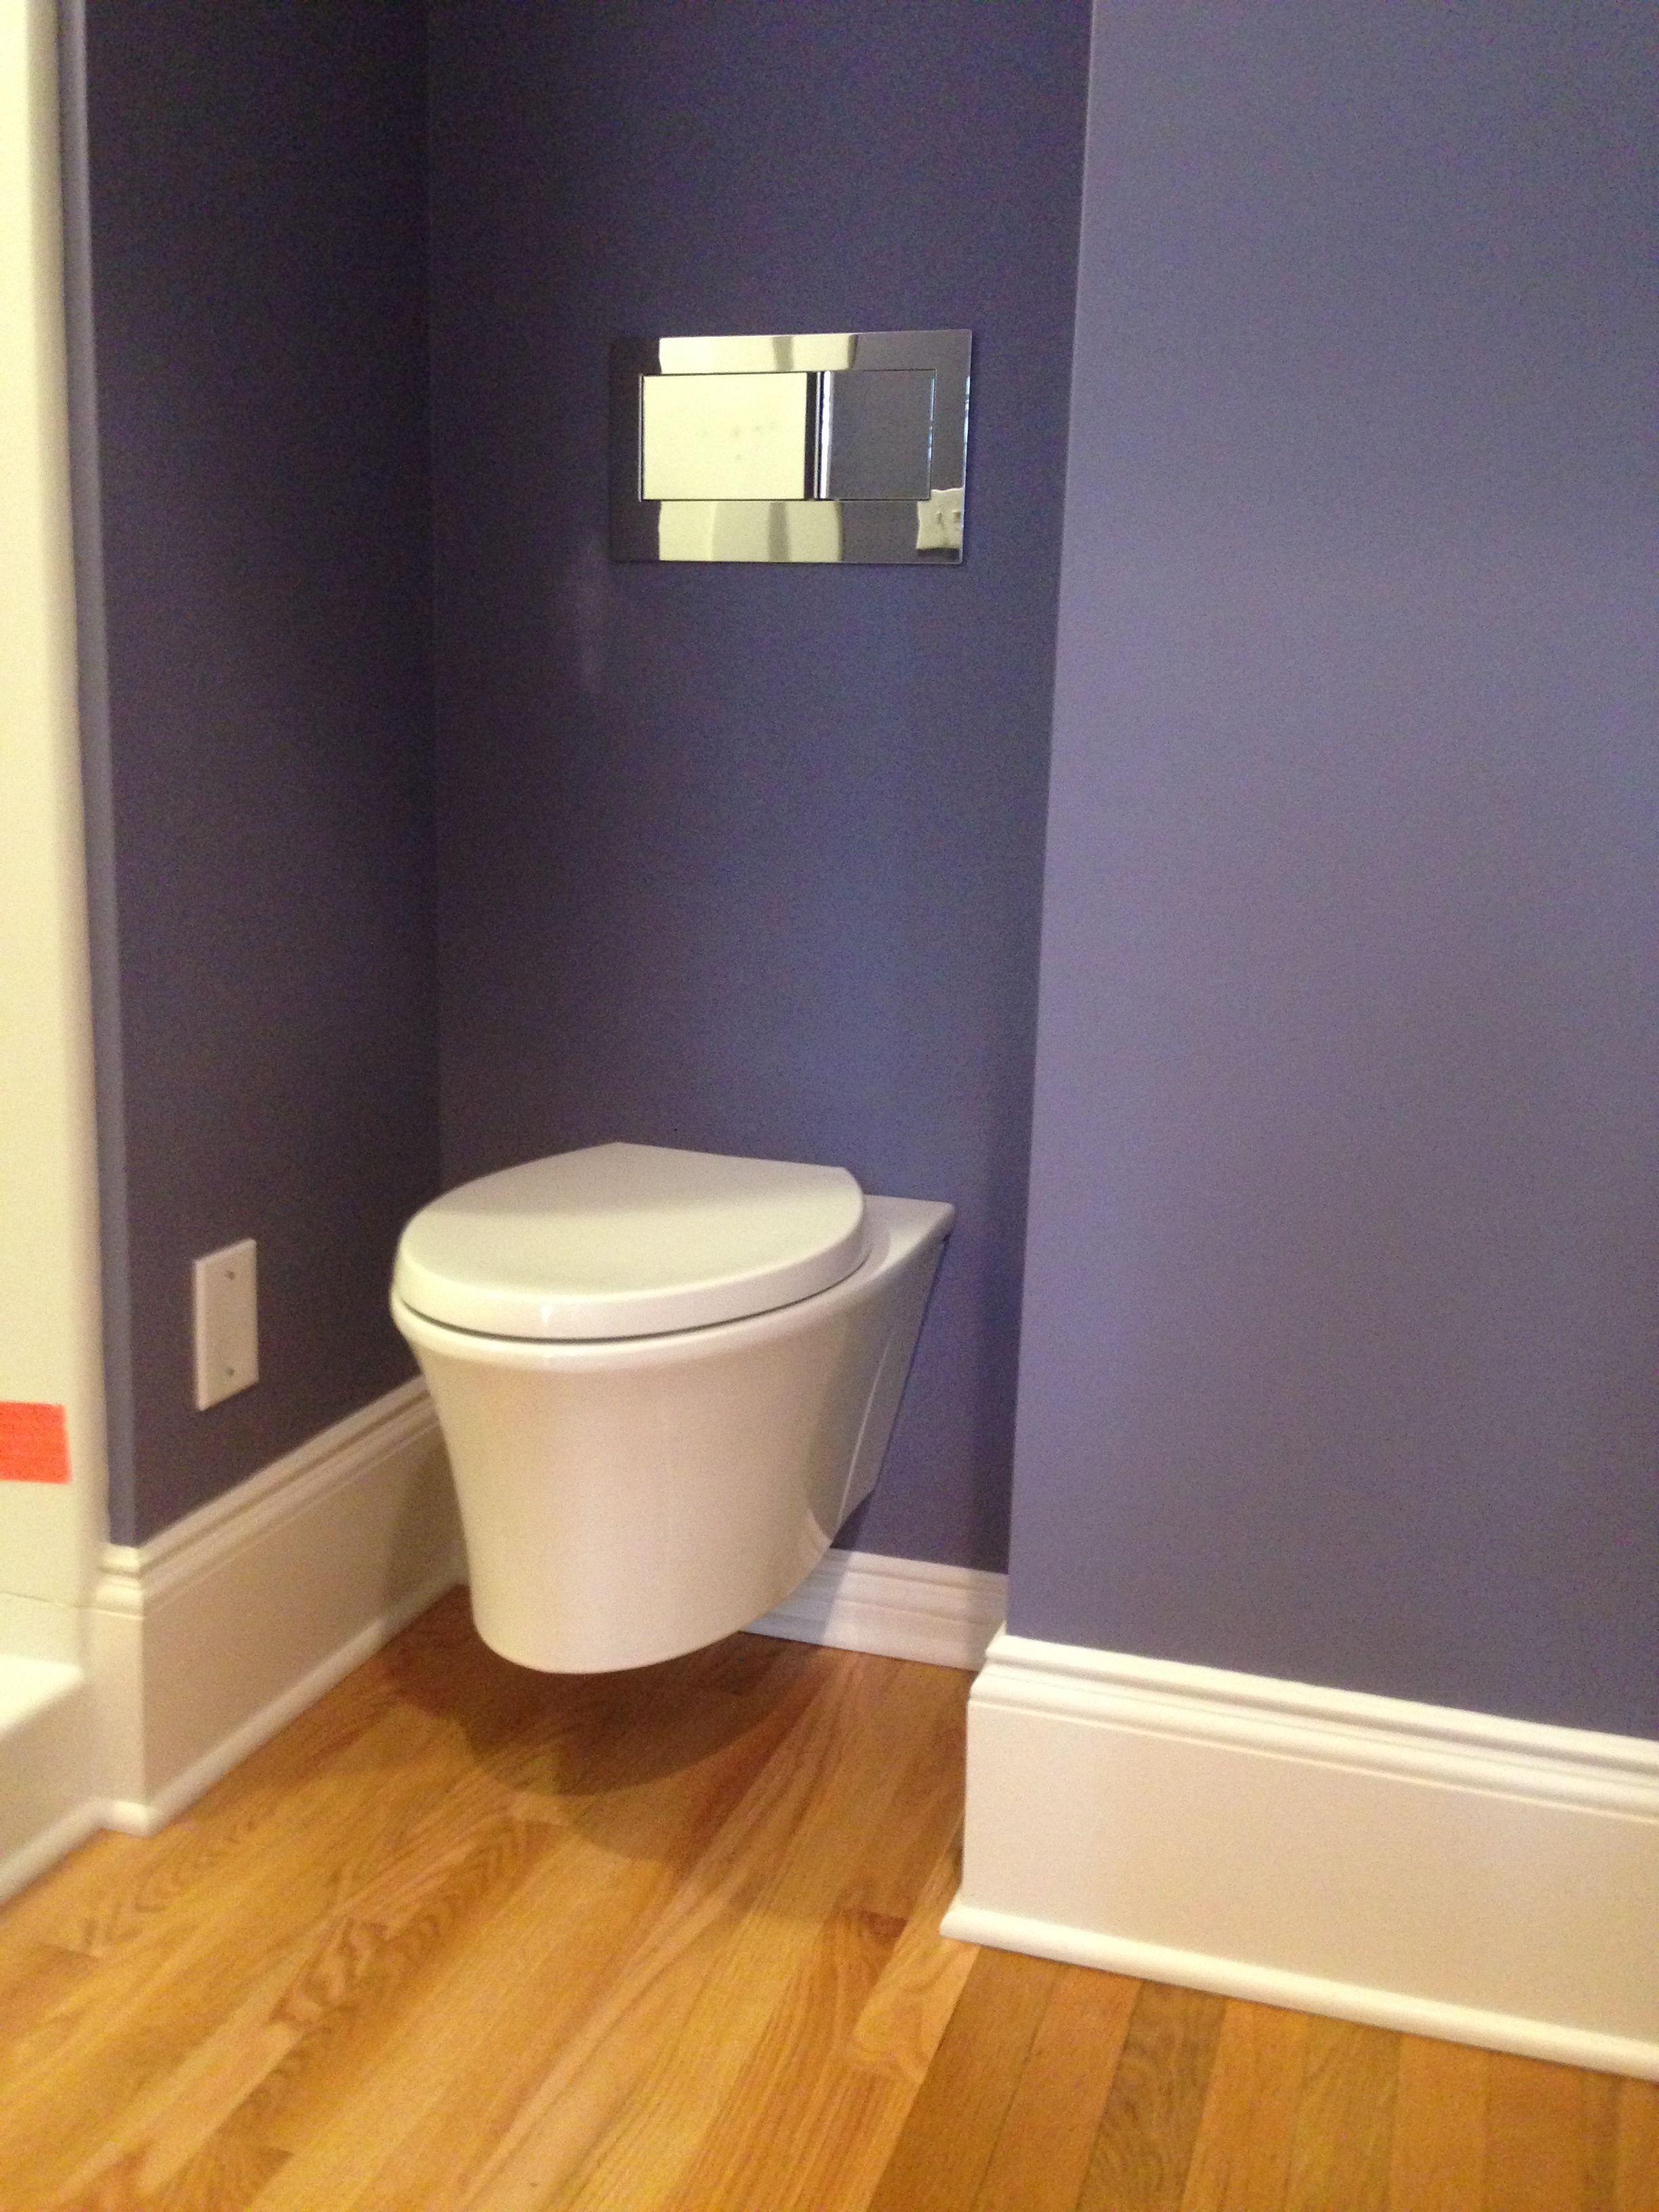 Kohler In Wall Tank Toilet With Images Toilet Bathroom Kohler